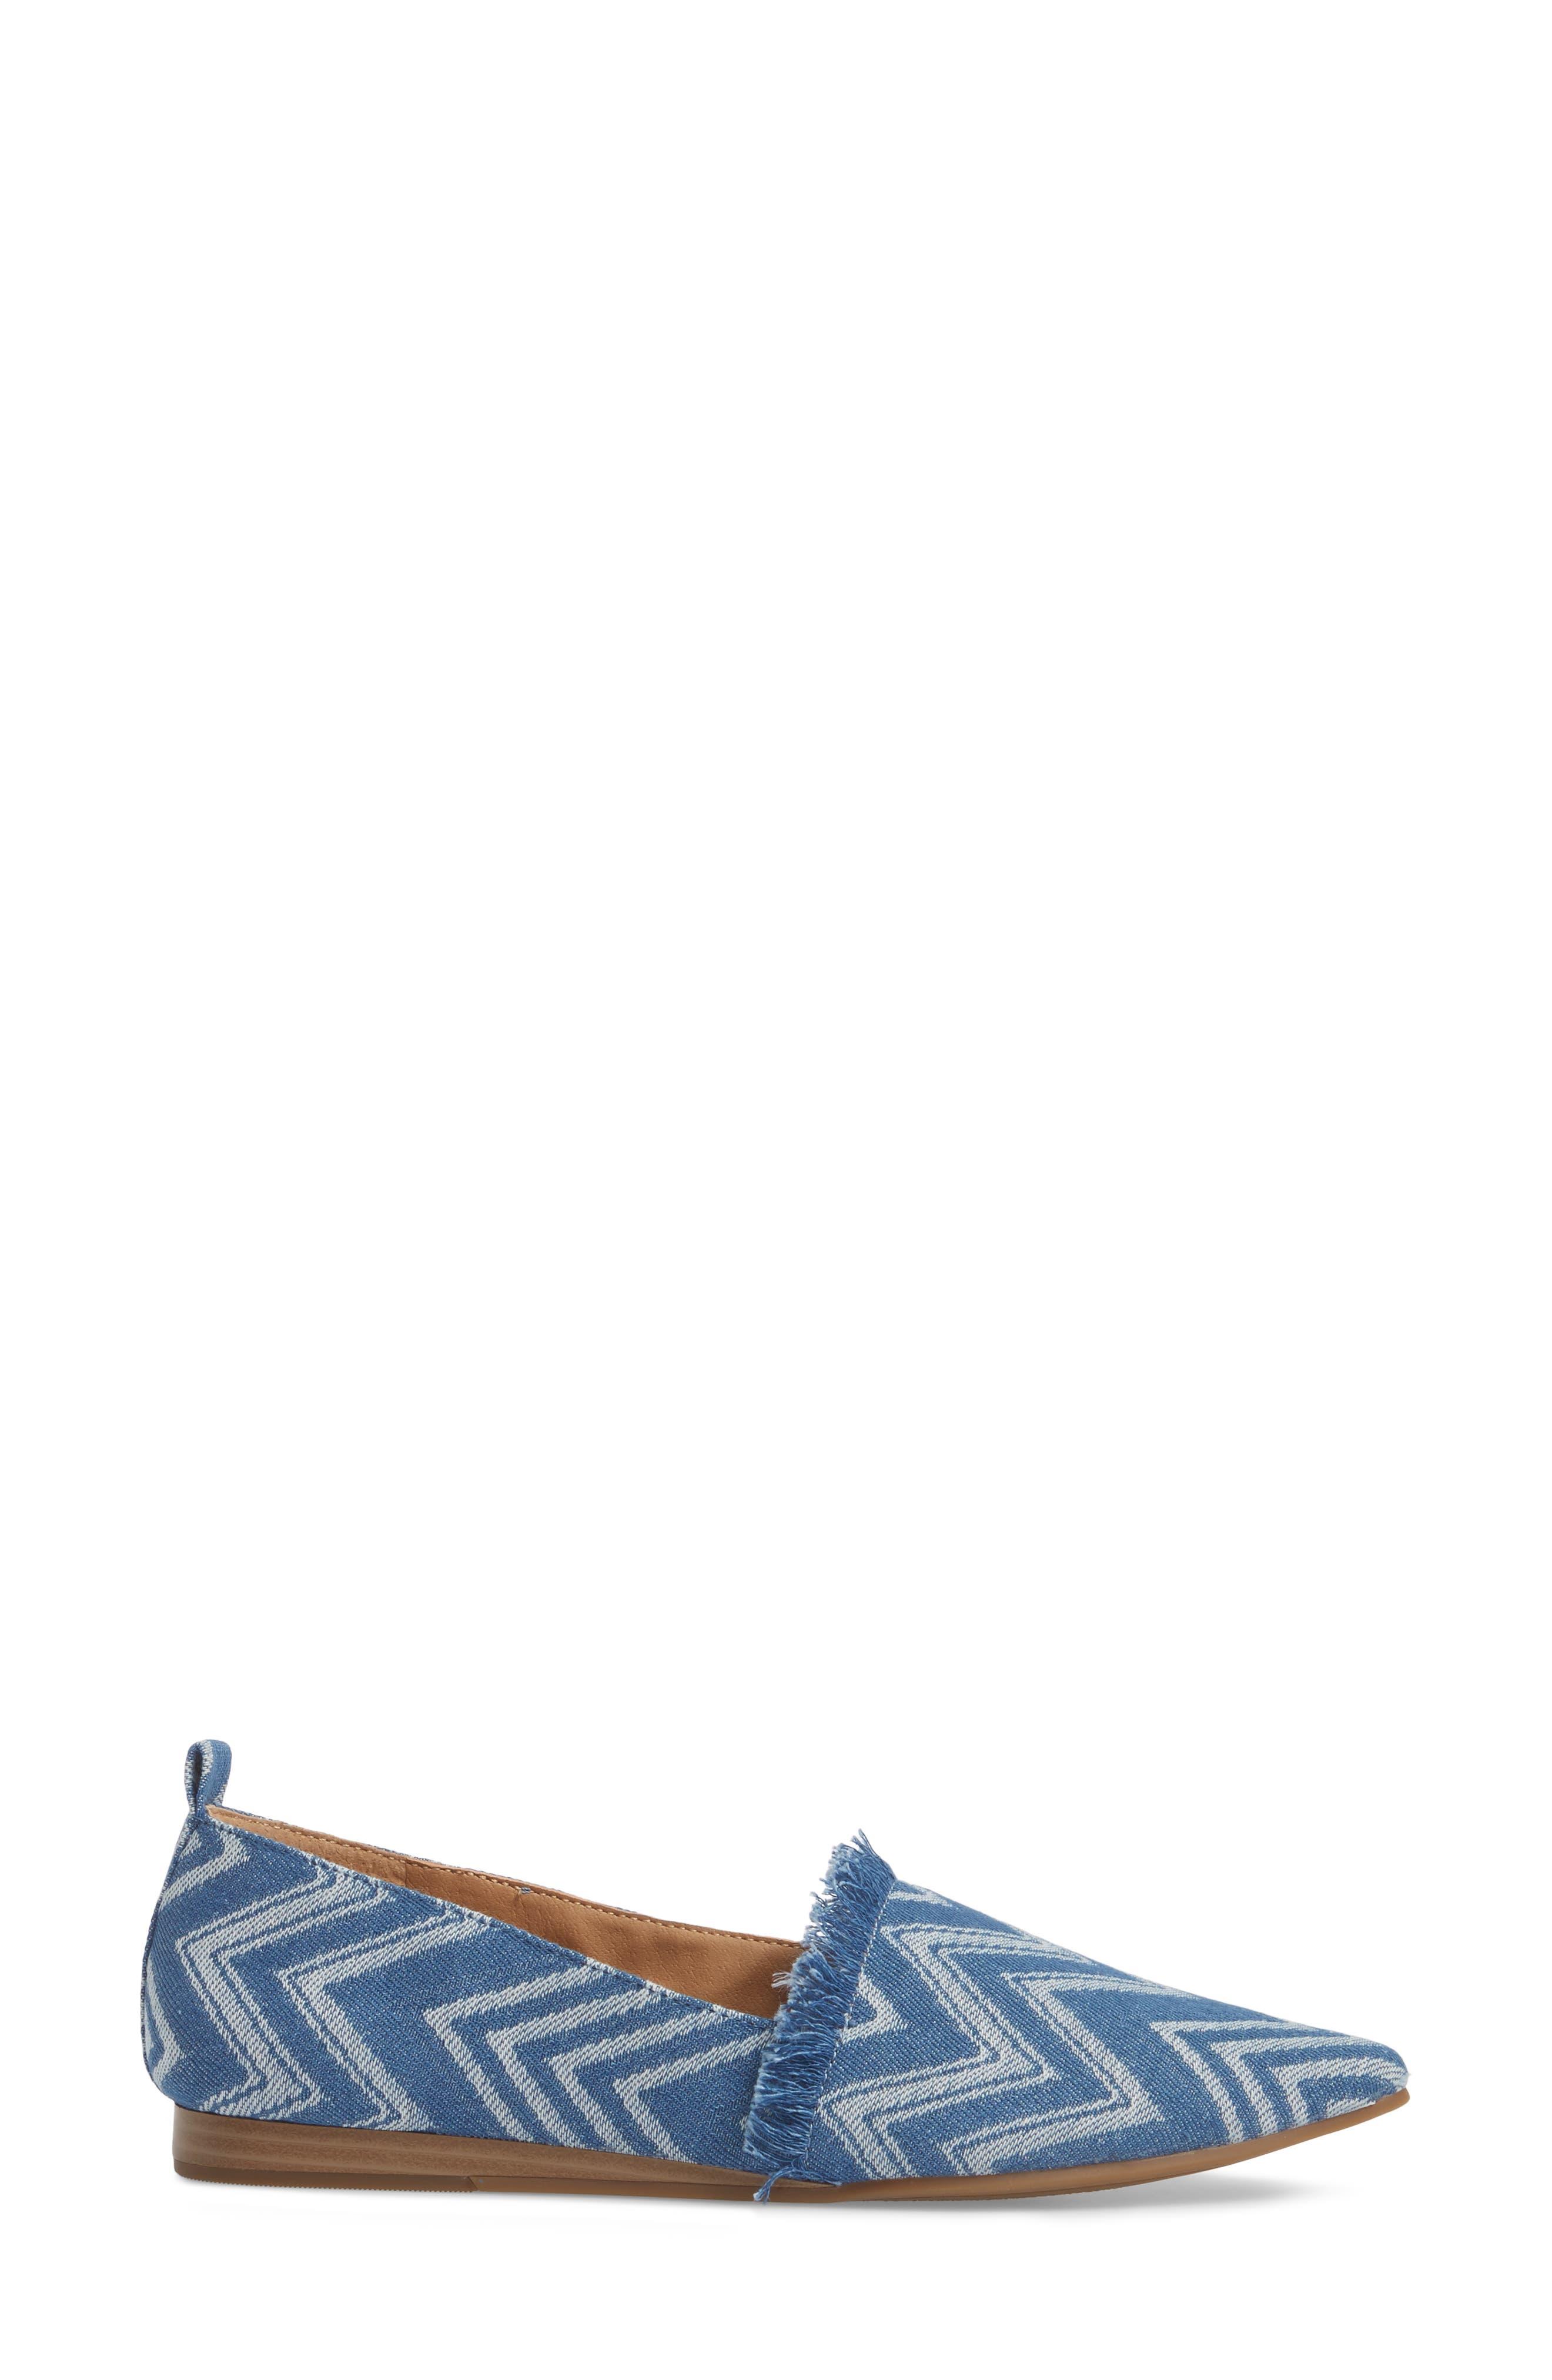 Alternate Image 3  - Lucky Brand Beechmer Pointy Toe Flat (Women)